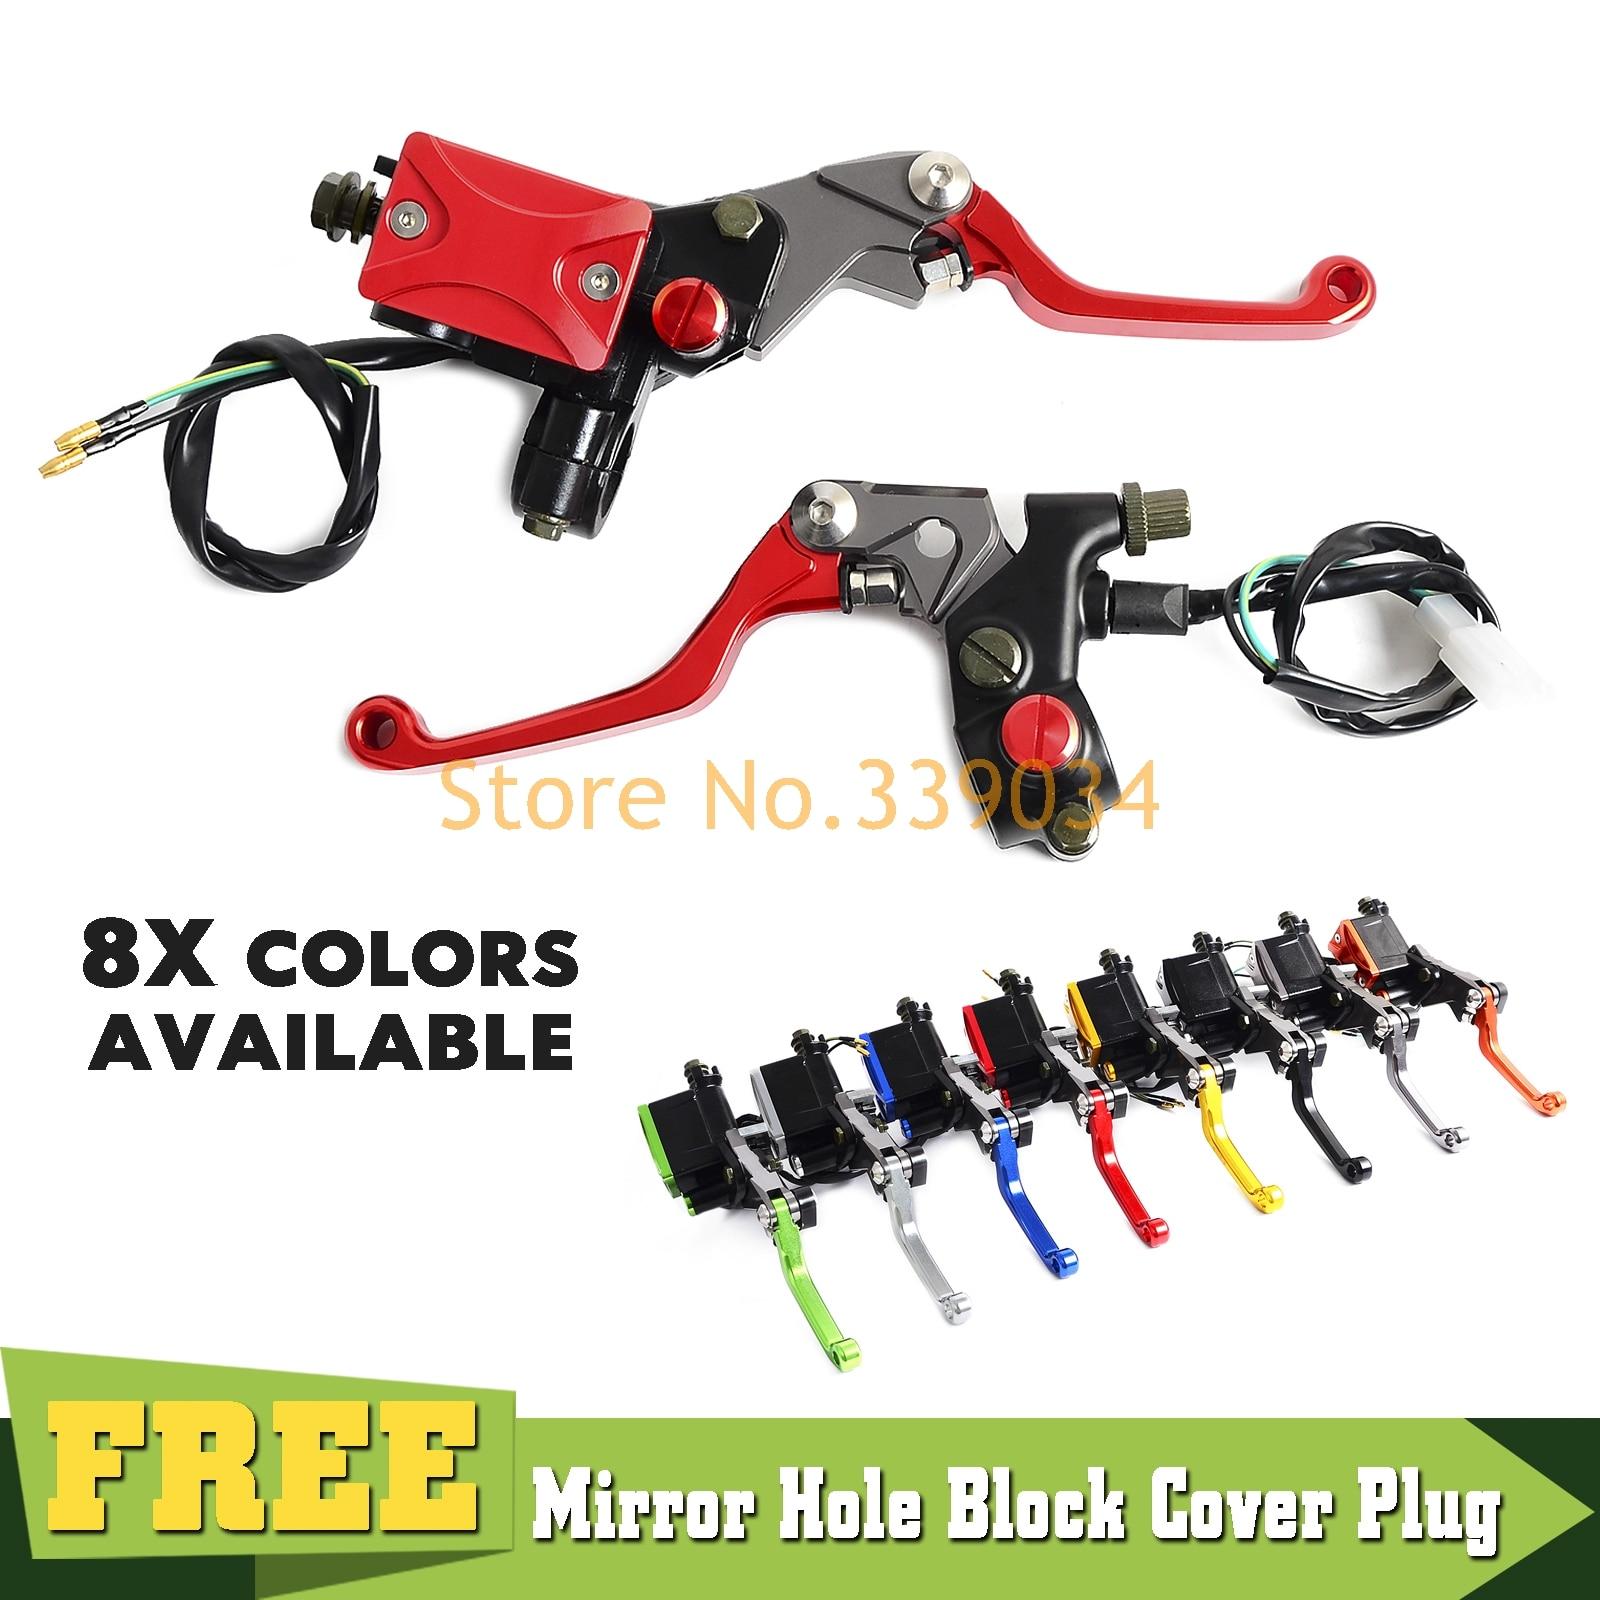 2PCS Fork Air Pressure Bleeder Valves Bolts For Honda CRF450R CRF450X 2005-2012